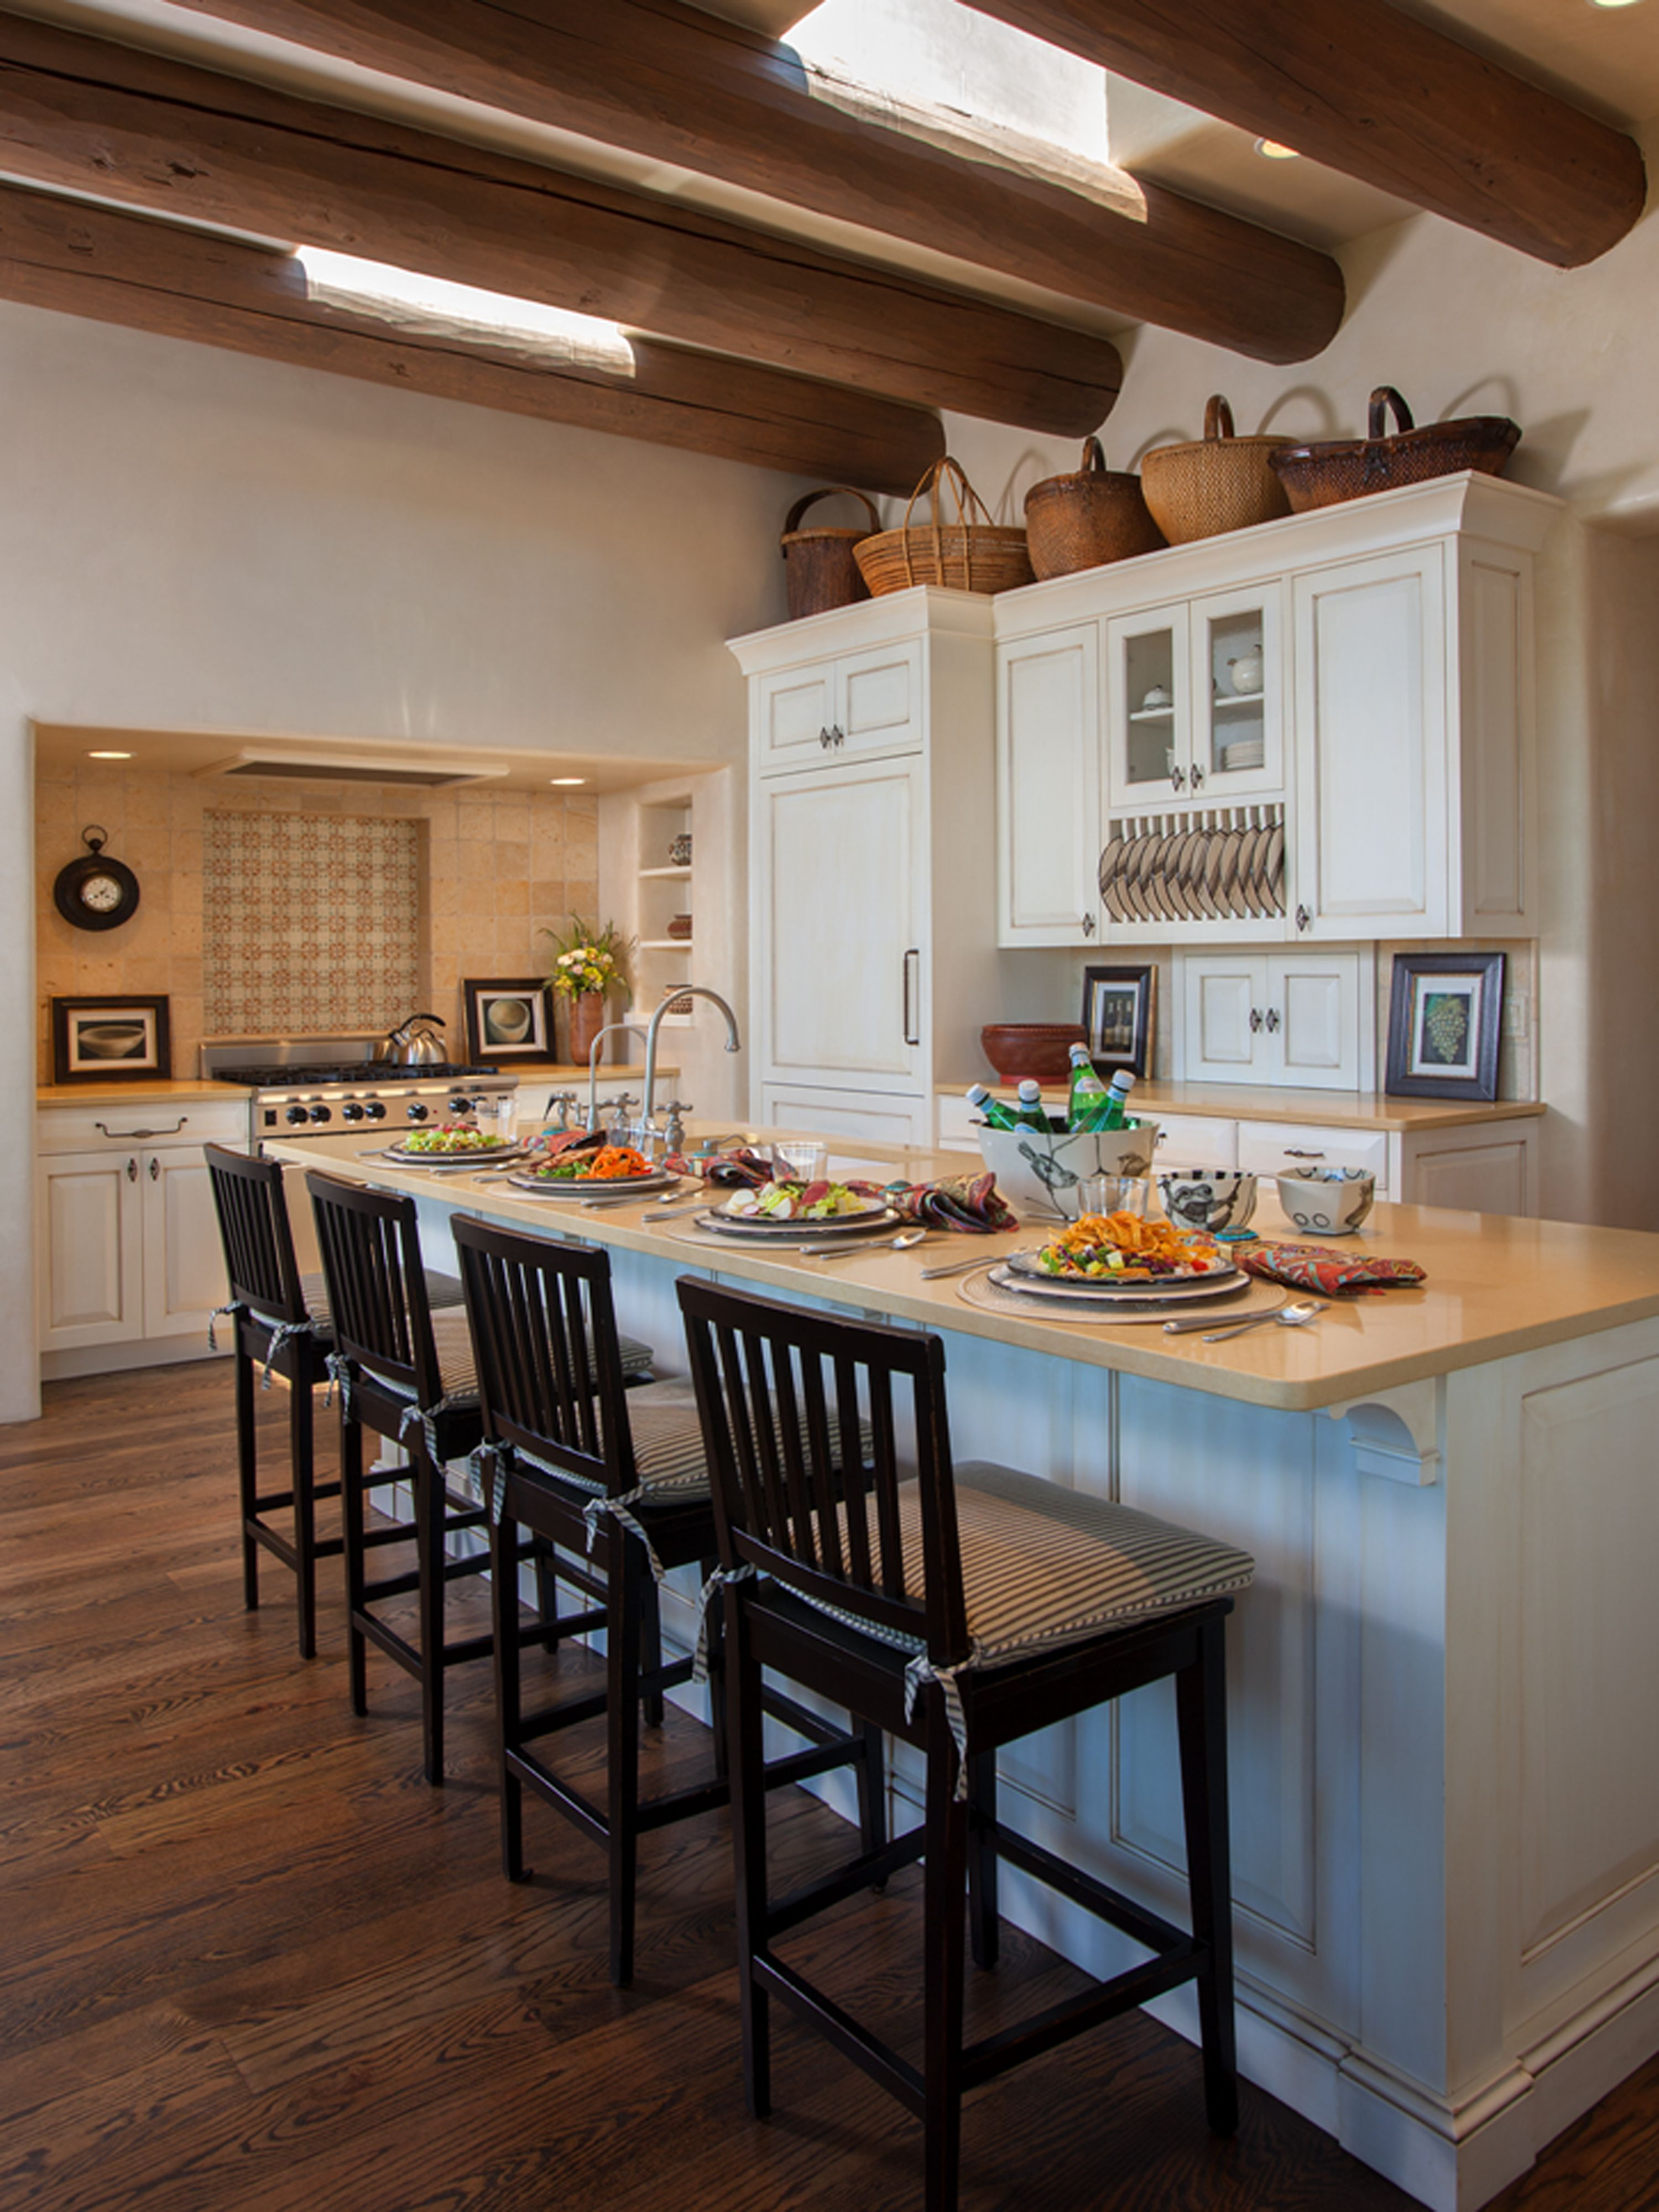 Uncategorized Southwest Kitchen Design step inside a stunning adobe home in santa fe design kitchen